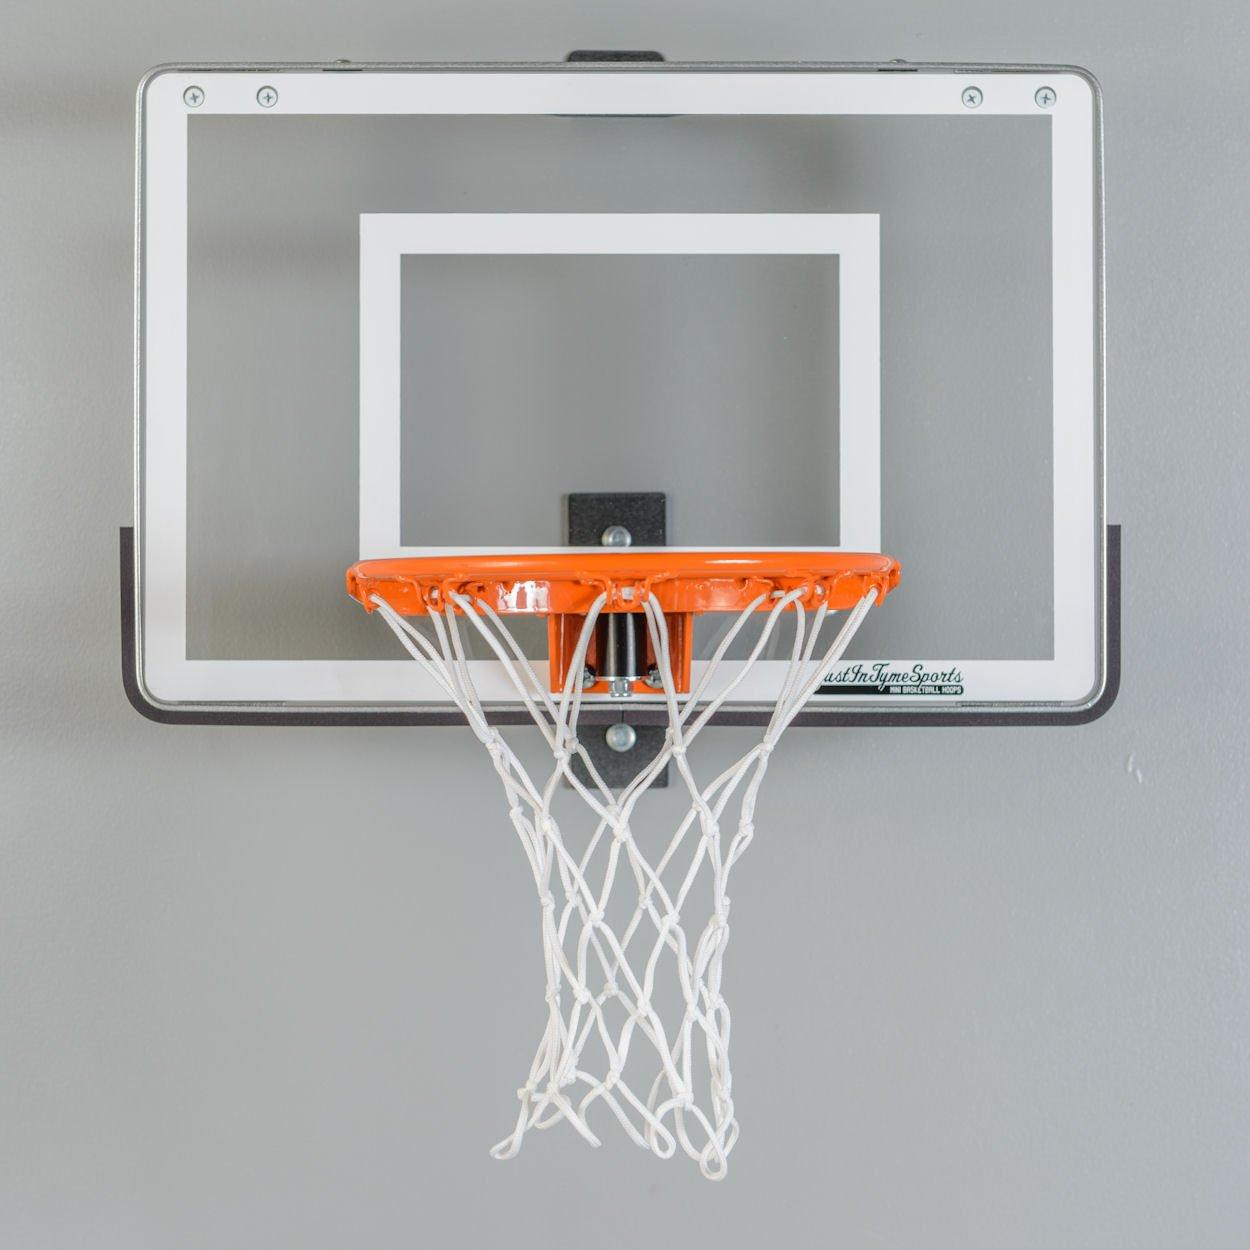 Amazon.com : Wall Mounted Mini Basketball Hoop - Mini Pro 1.0 ...